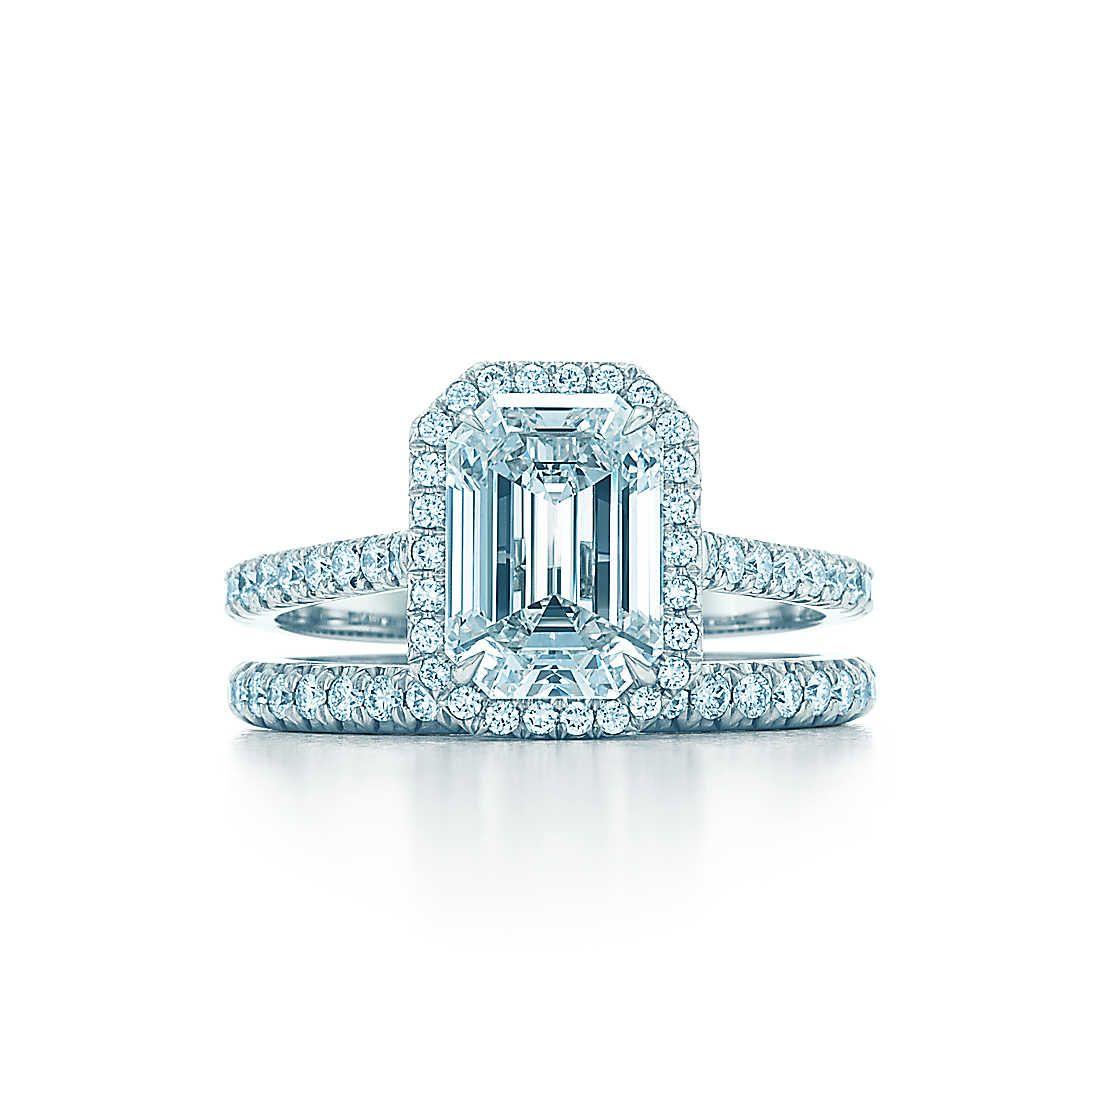 Emerald Cut Diamond Engagement Rings Tiffany Soleste Engagement Rings Tiffany